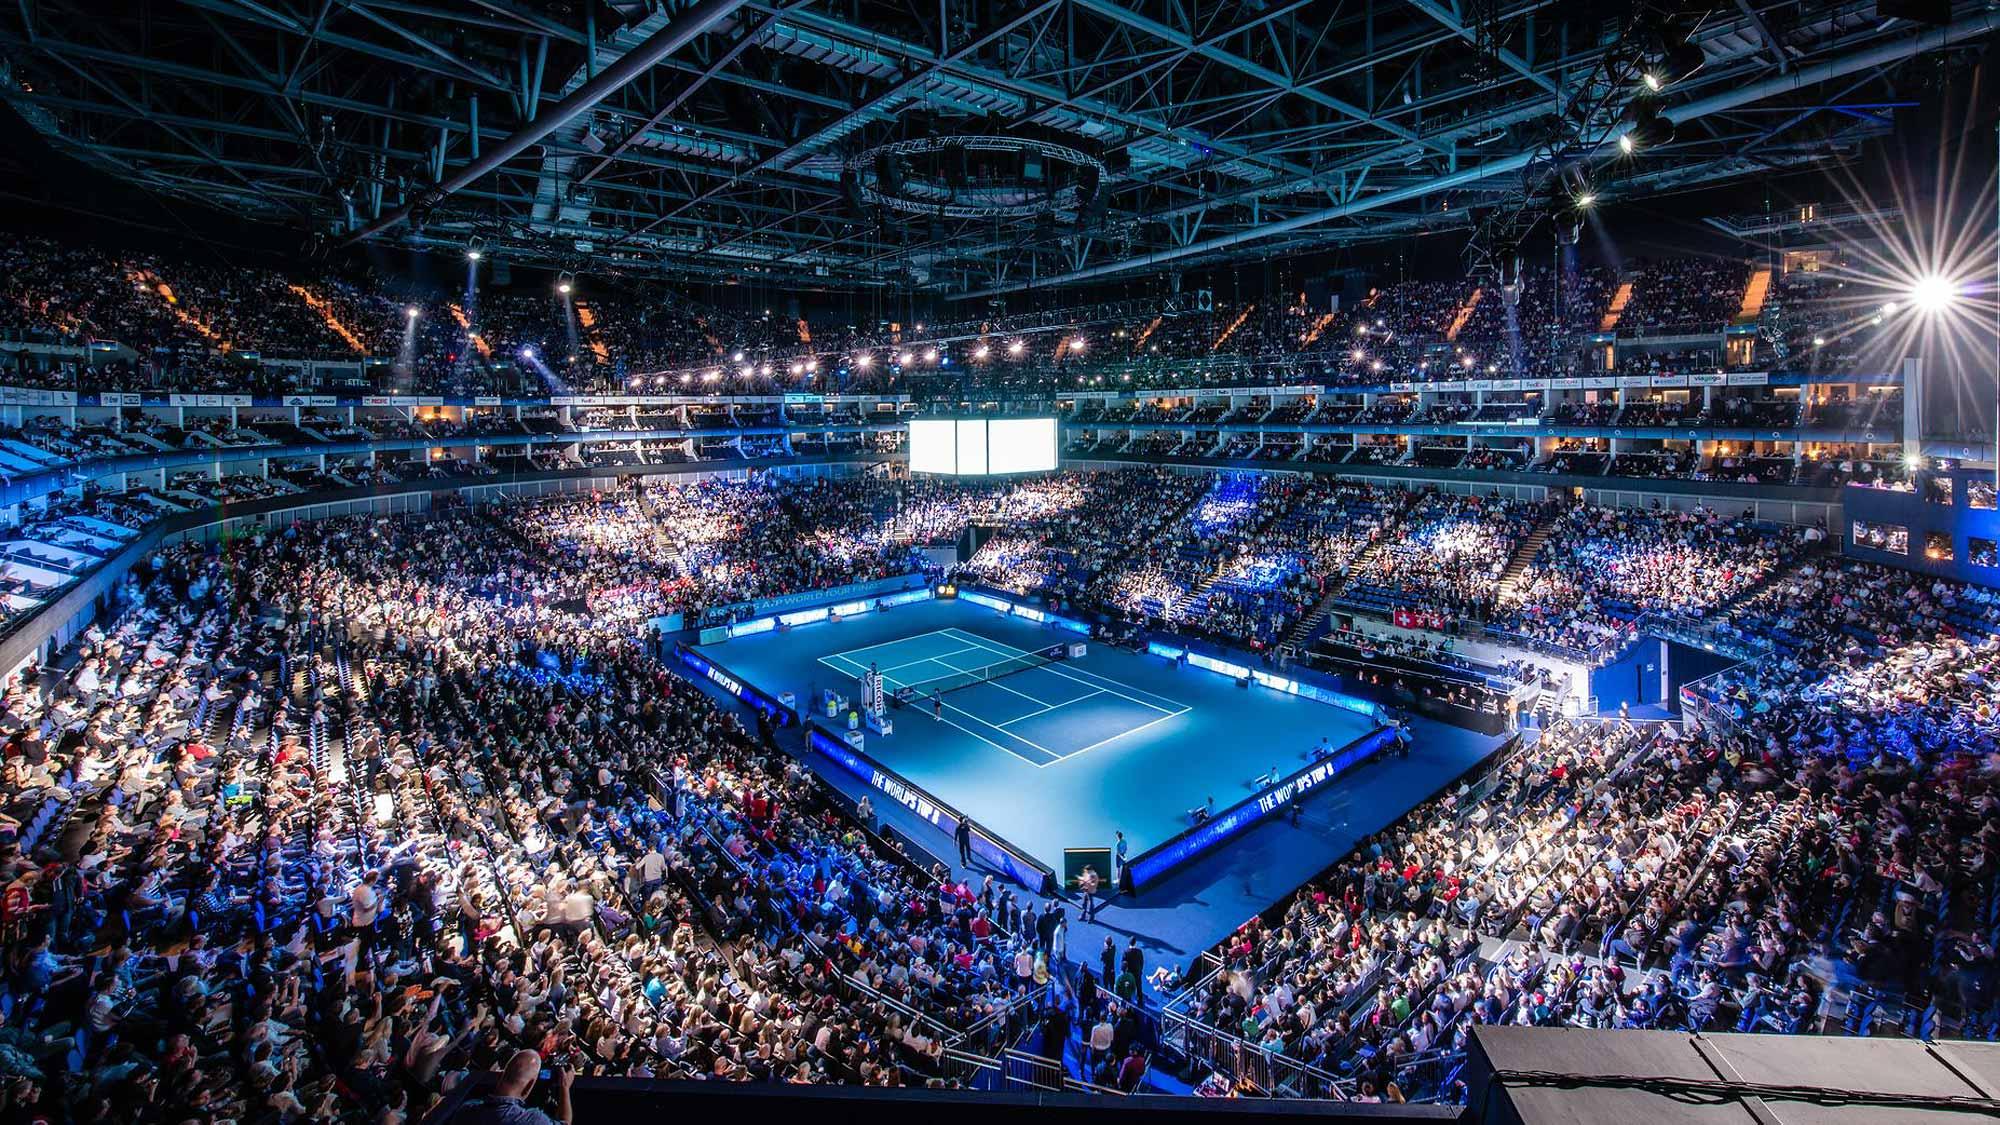 Rekordmani tenisového světa